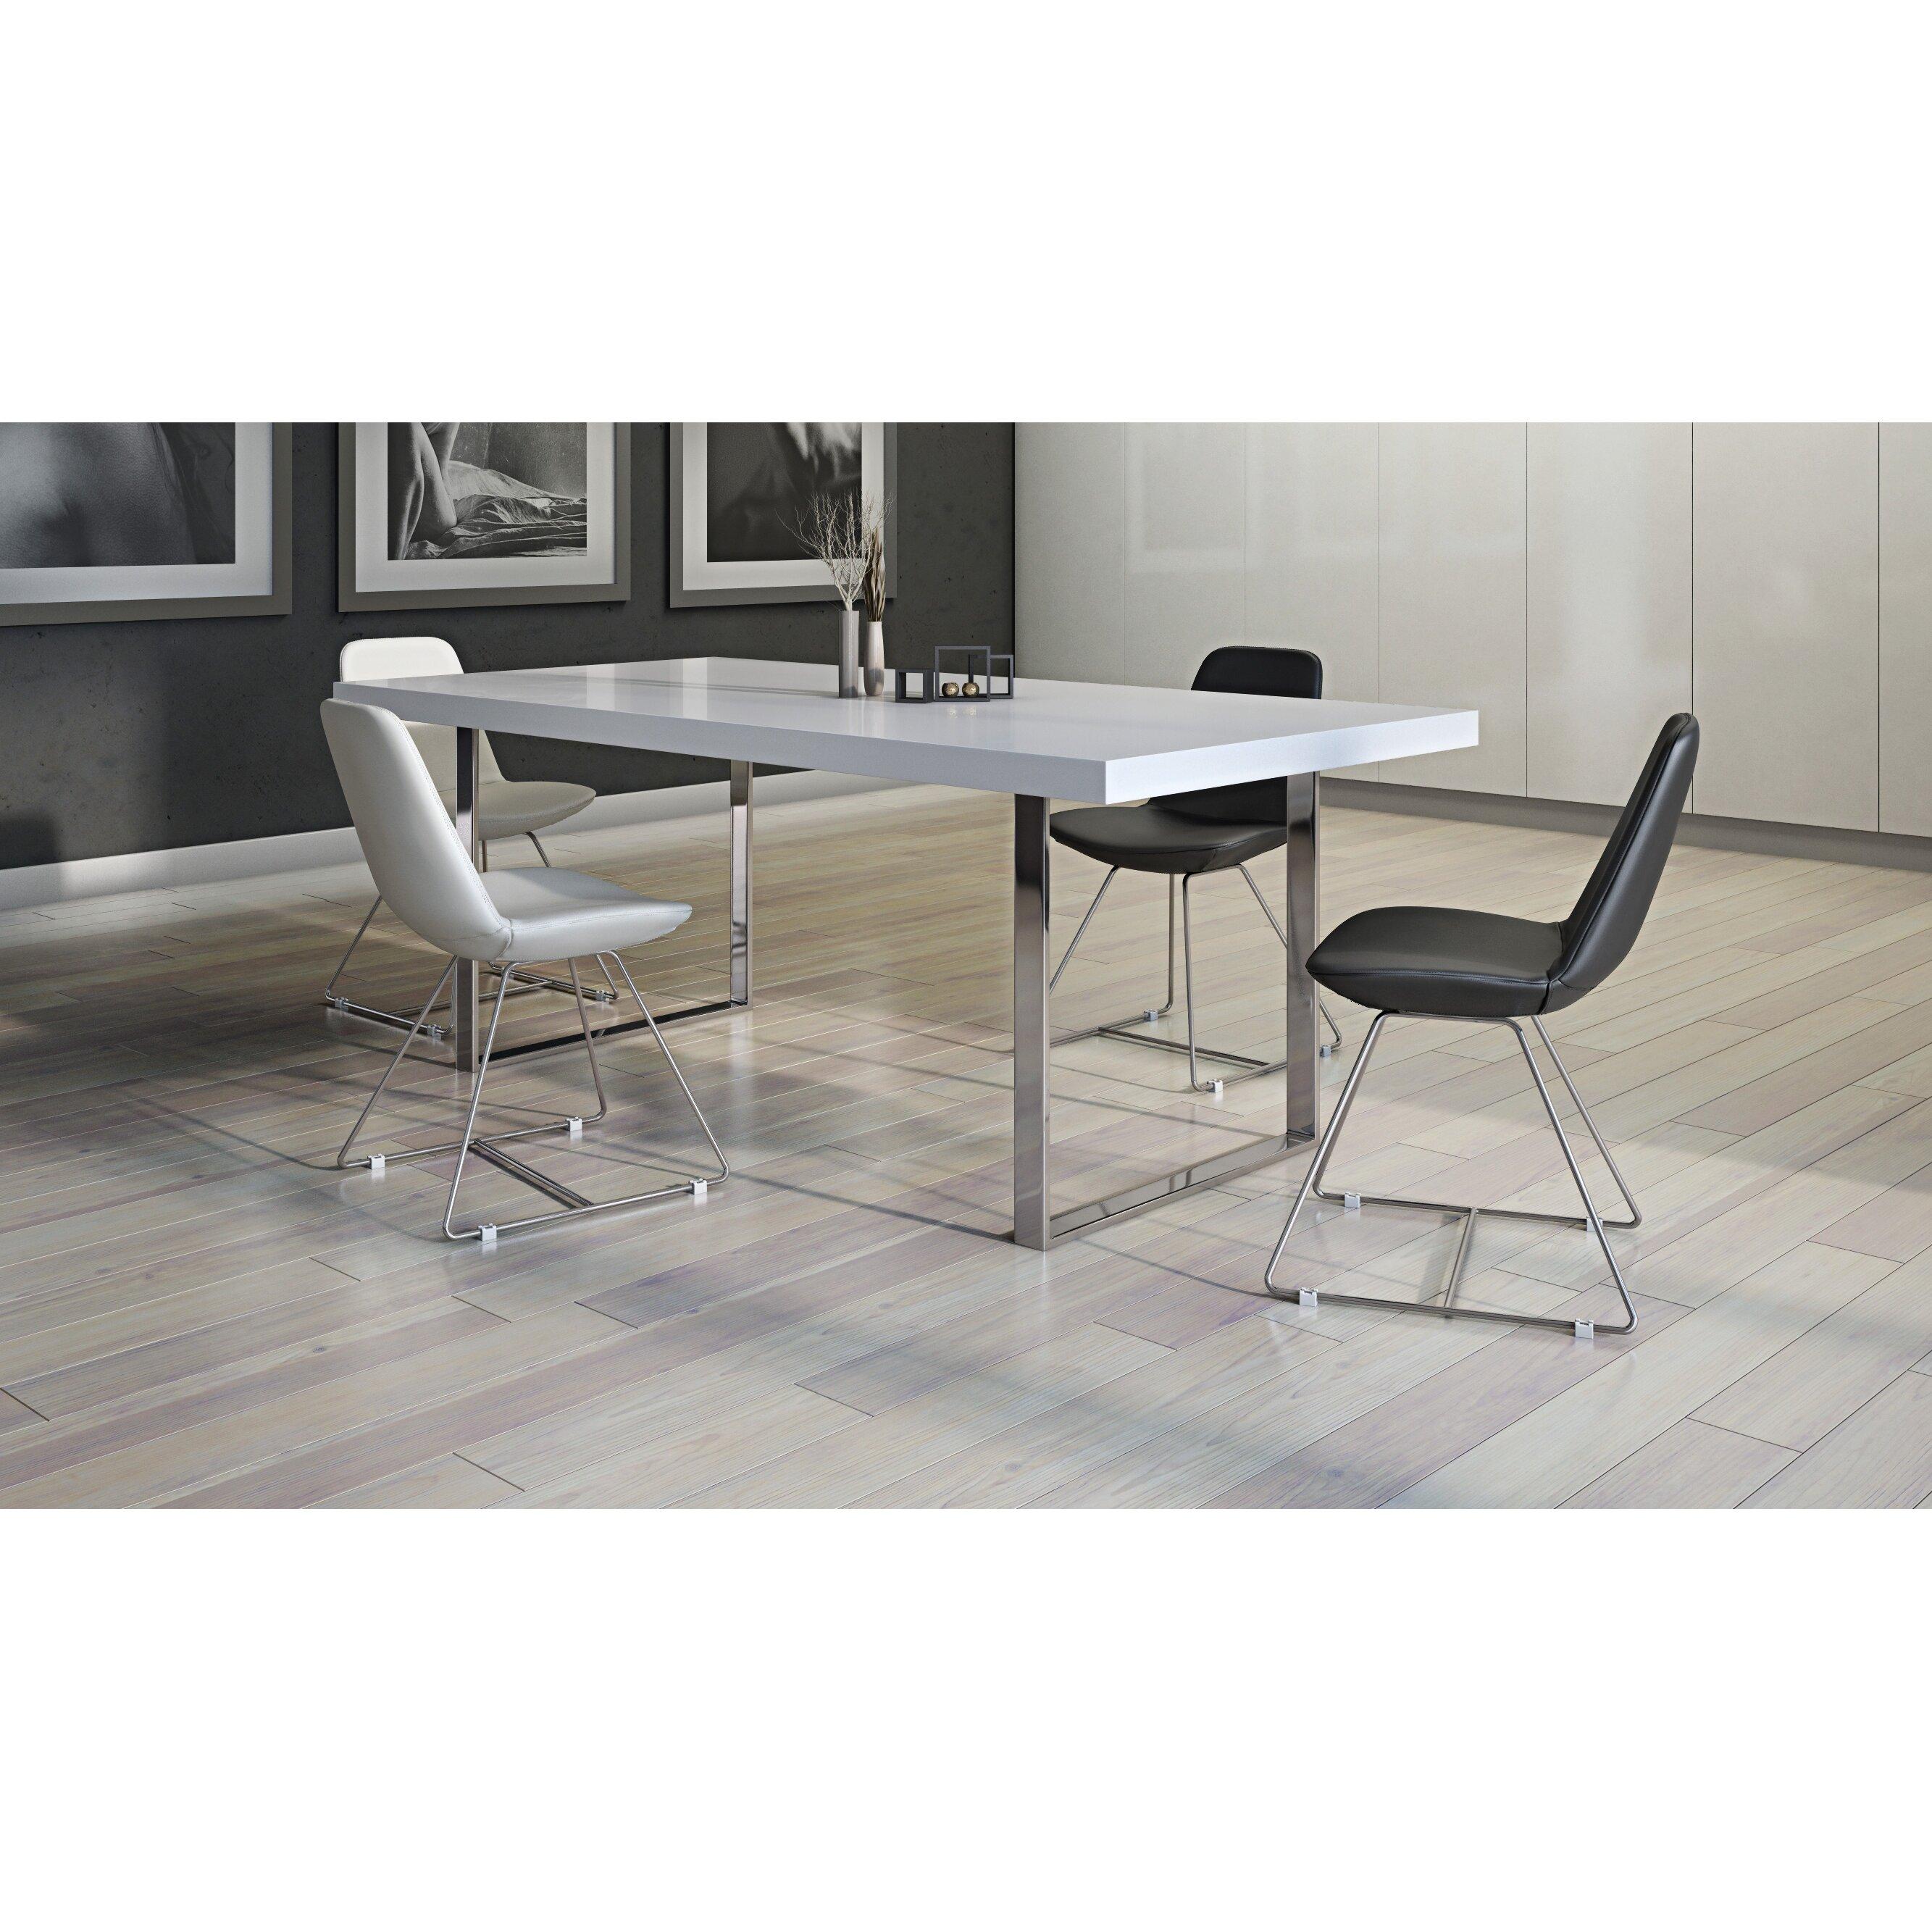 Ashley Furniture In Brandon Fl: Aeon Furniture Brandon Dining Table & Reviews